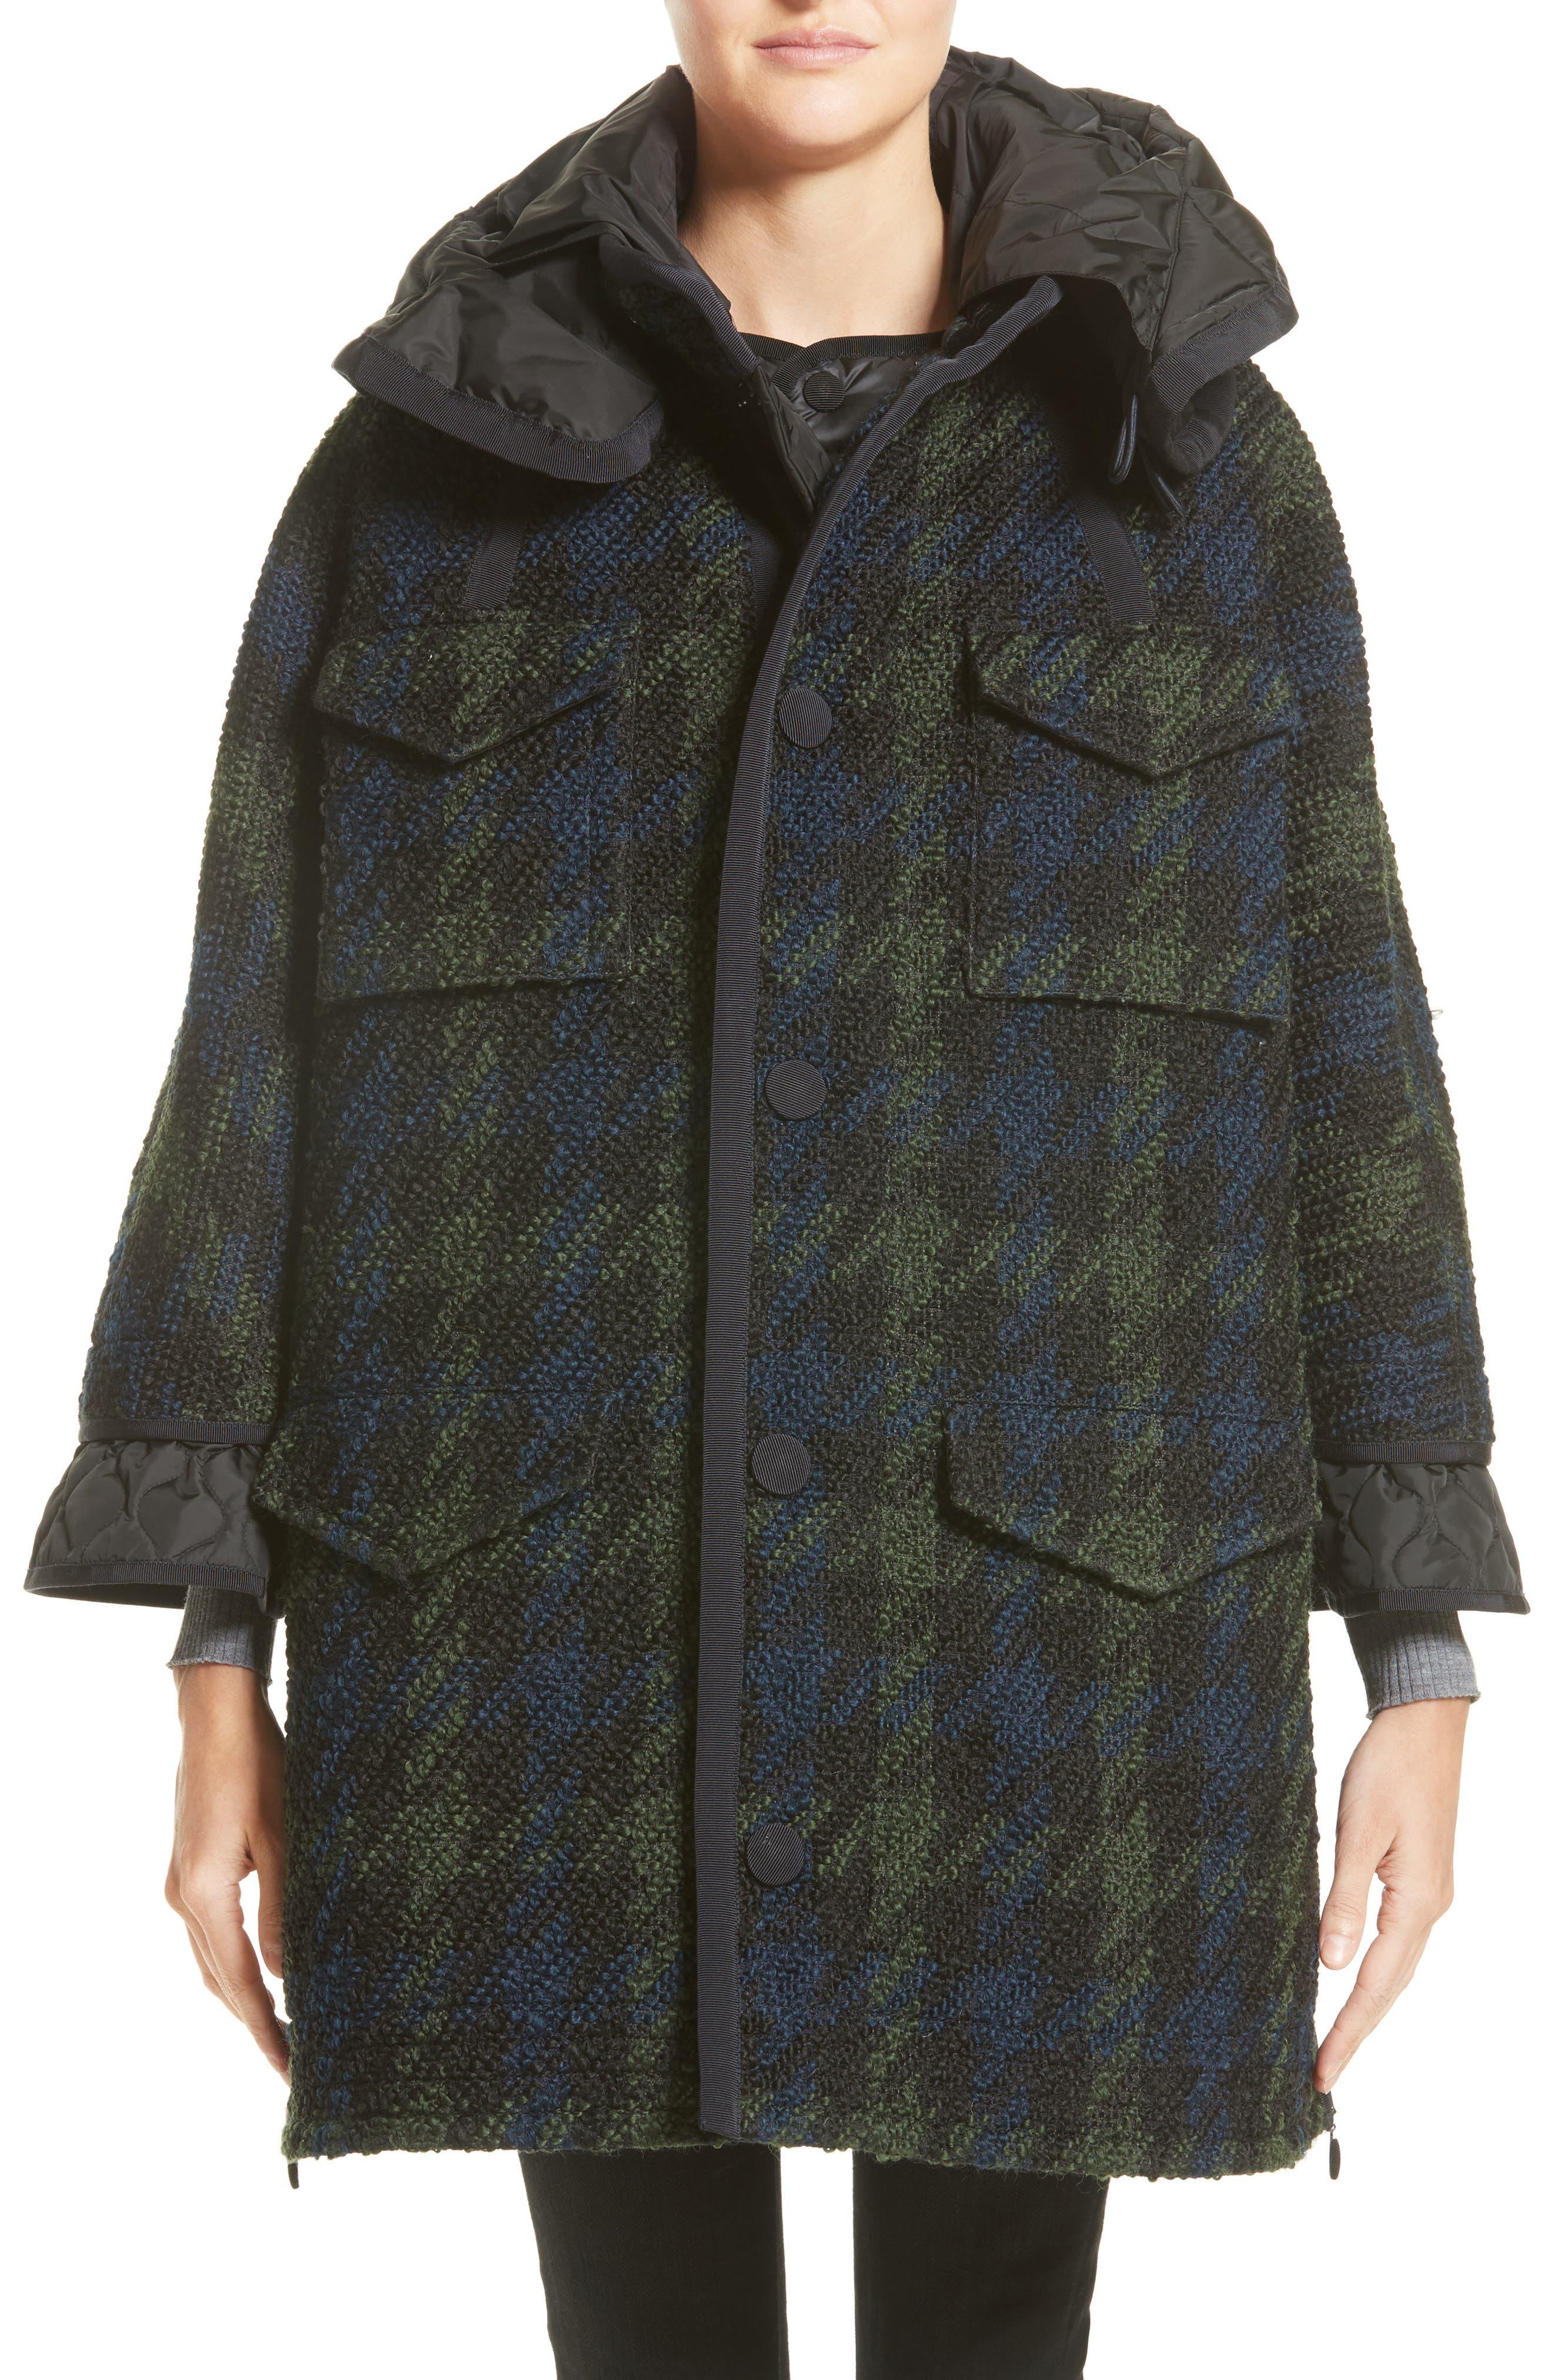 Euphrasie Wool Blend Houndstooth Coat,                             Main thumbnail 1, color,